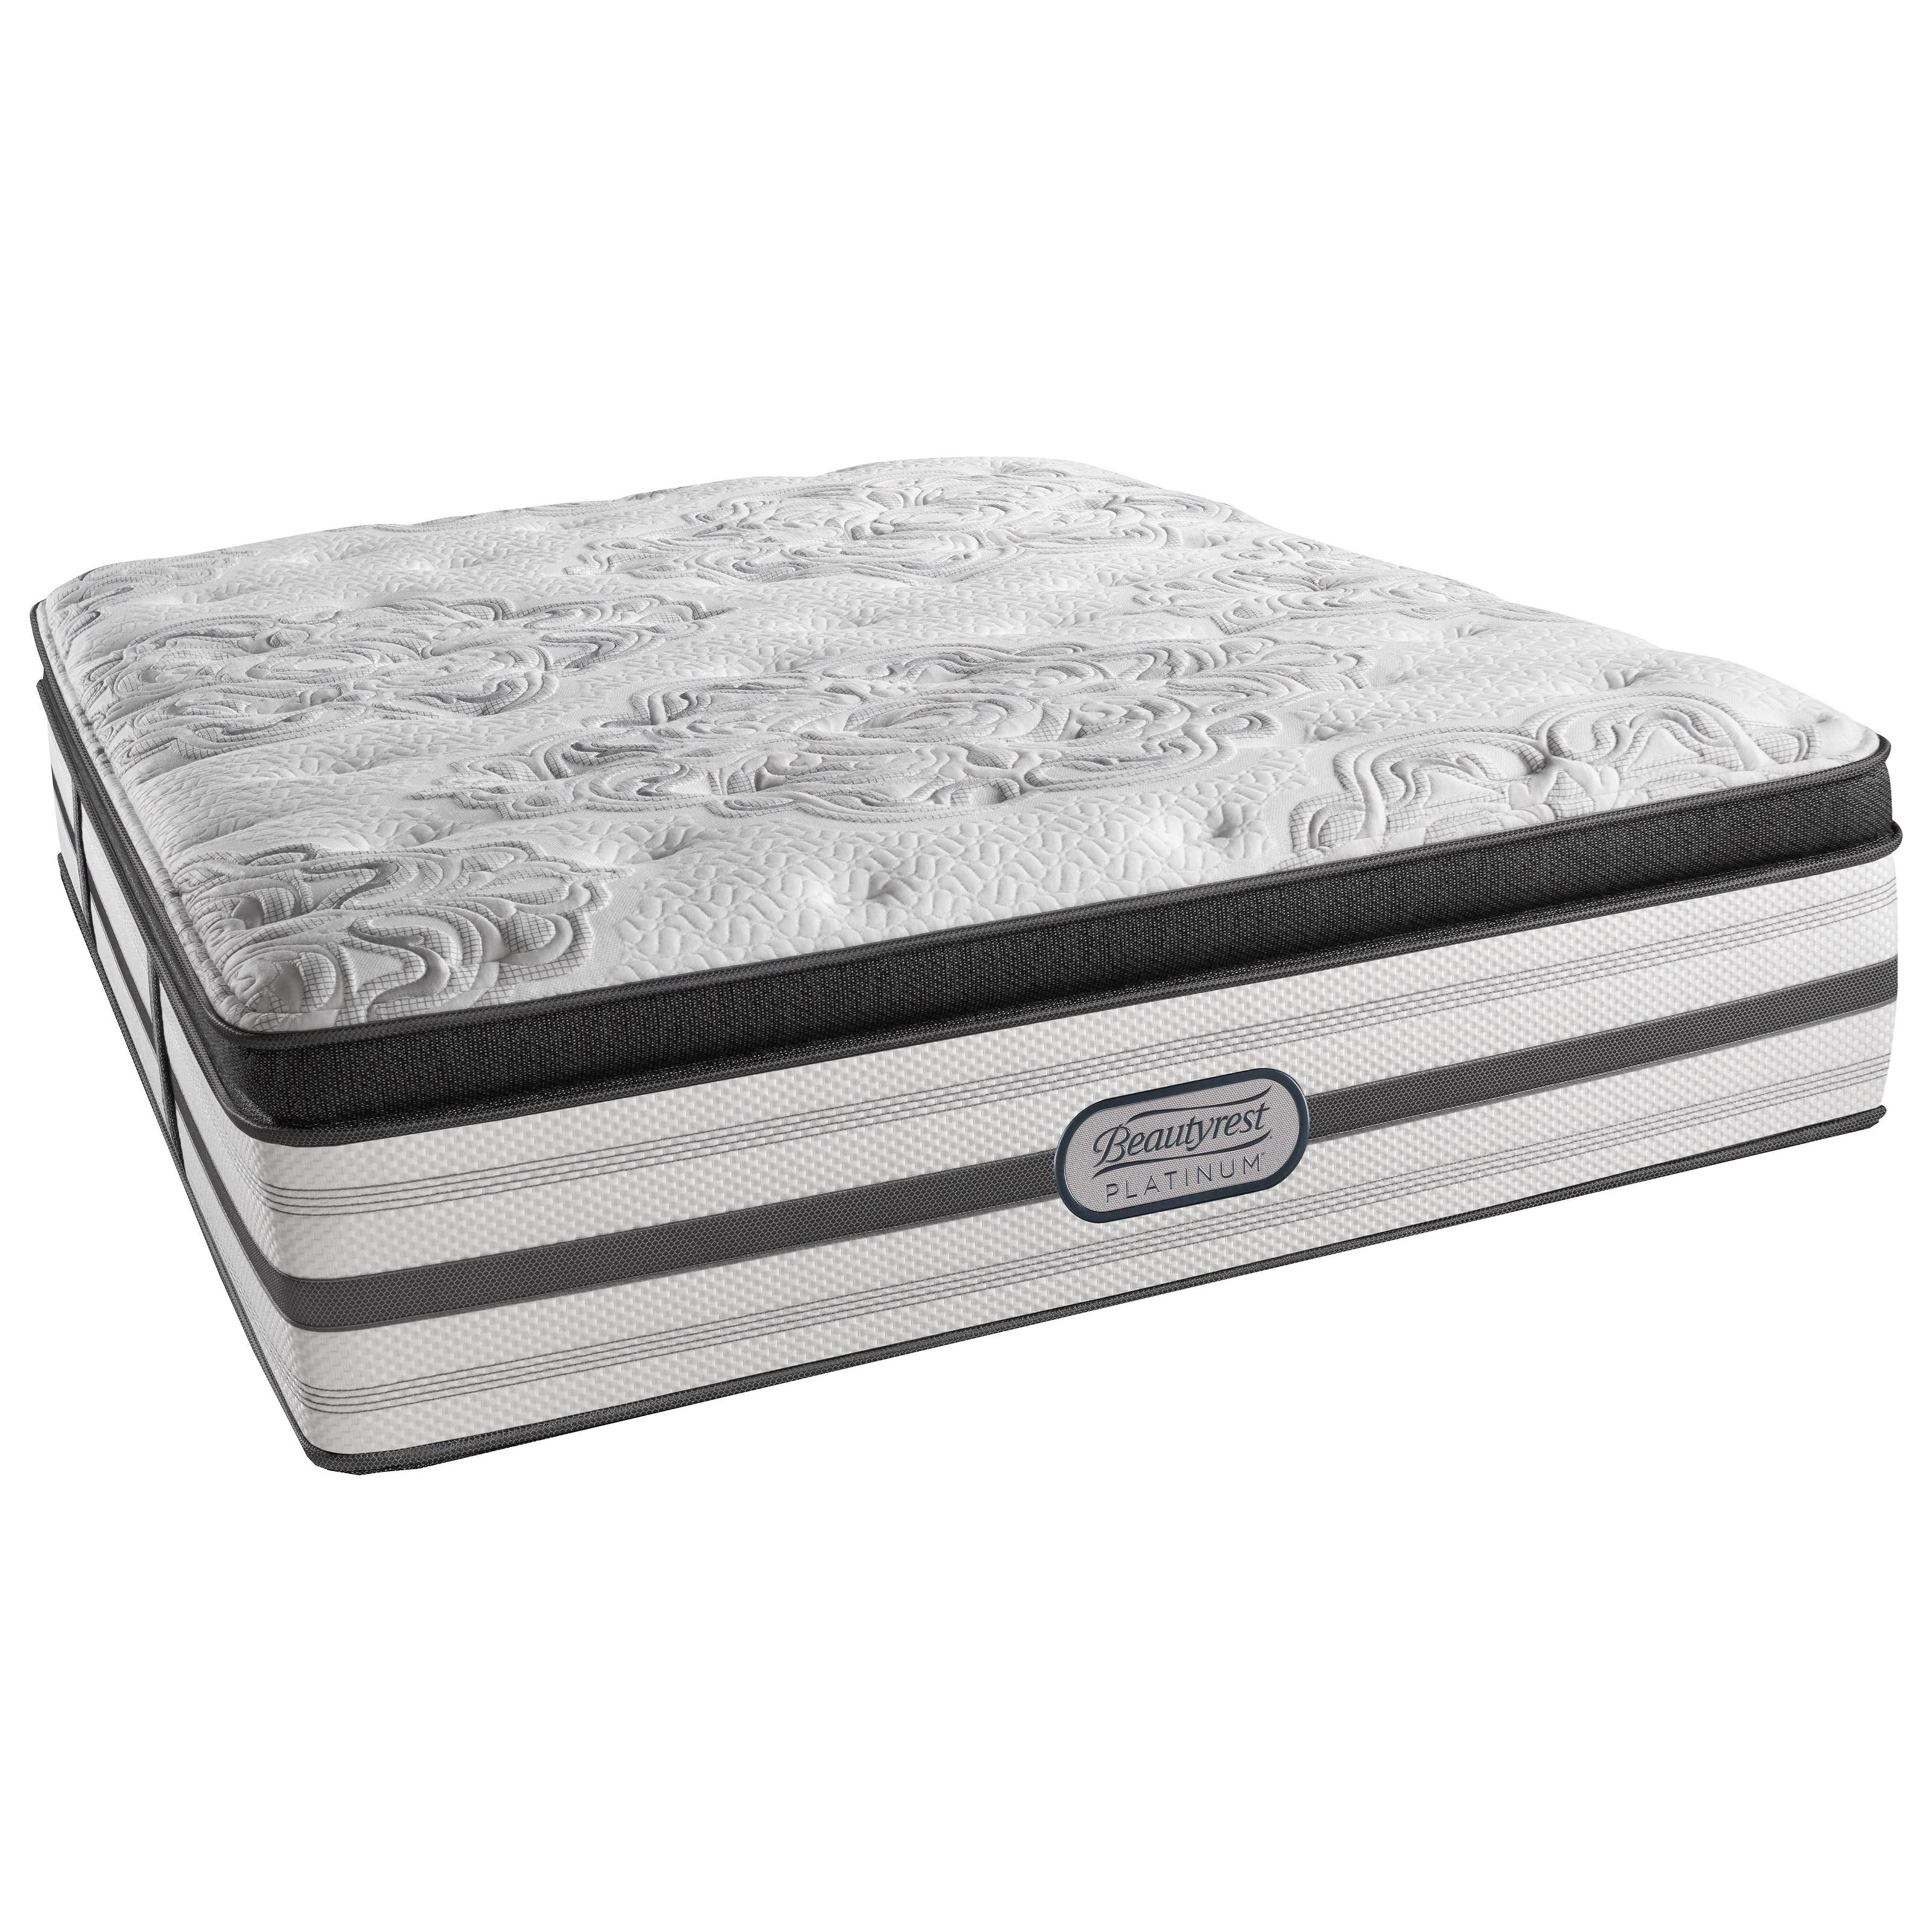 "Beautyrest Platinum Katherine Cal King Luxury Firm Box PT 16 1/2"" Mattress - Item Number: LV4LFBT-CK"